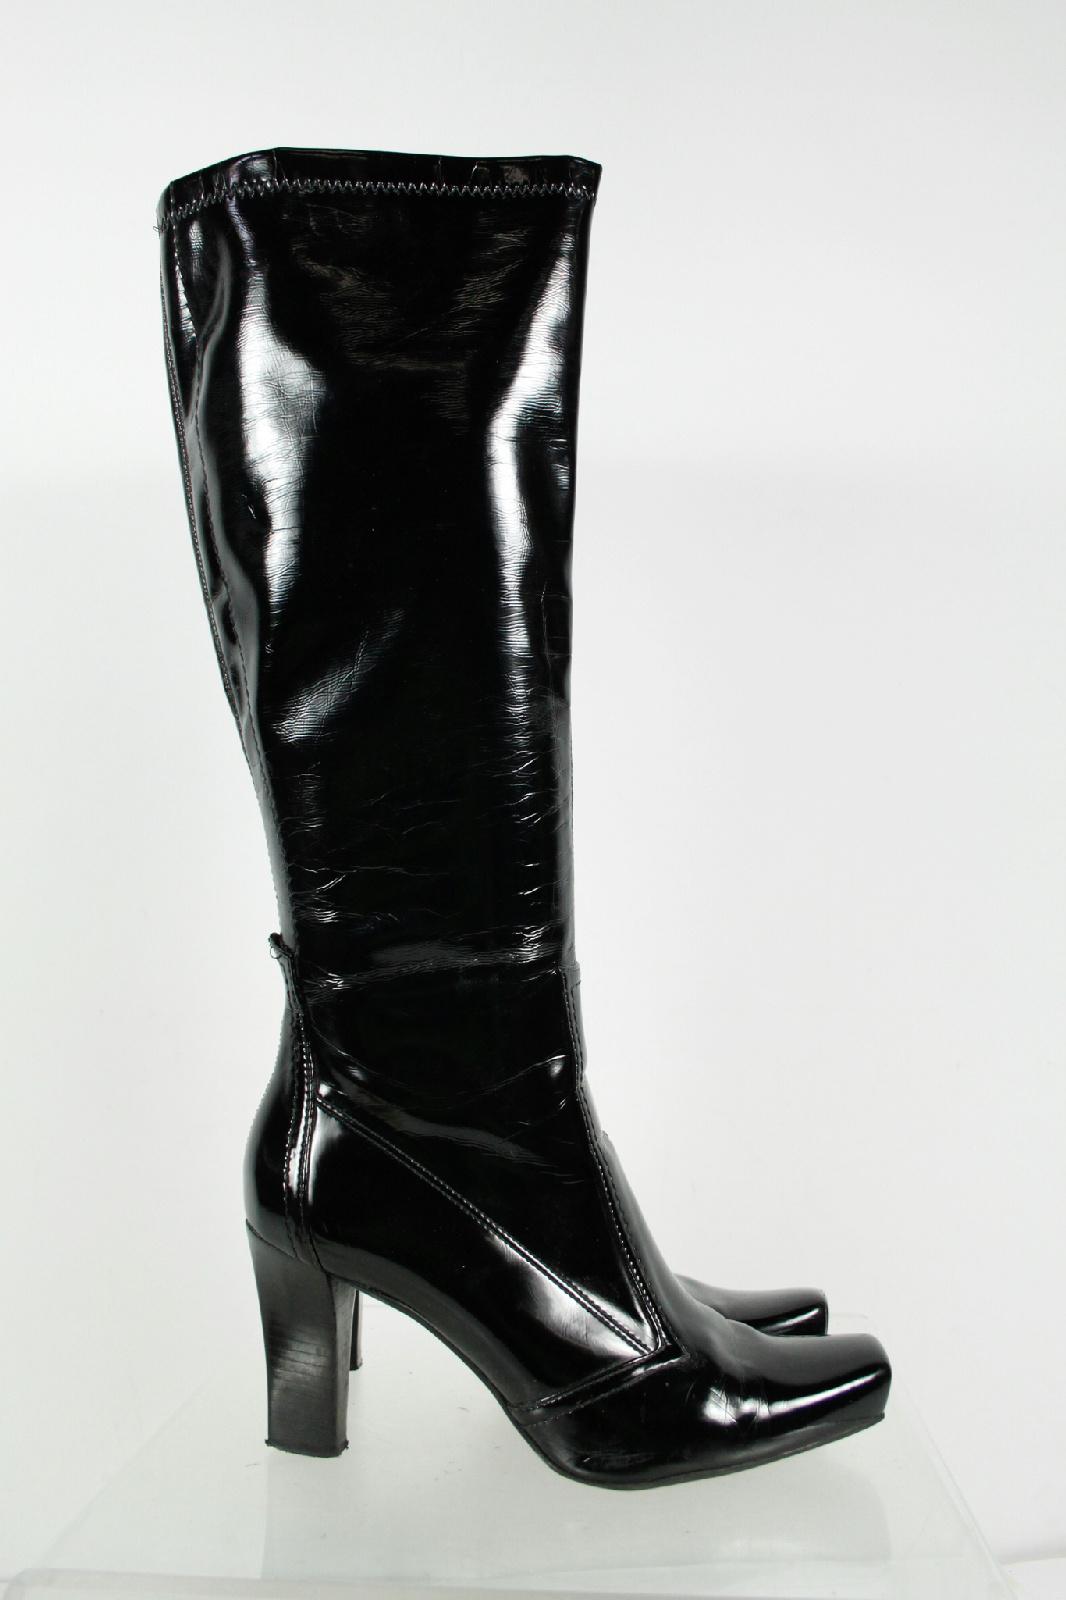 franco sarto black patent leather square toe block heel